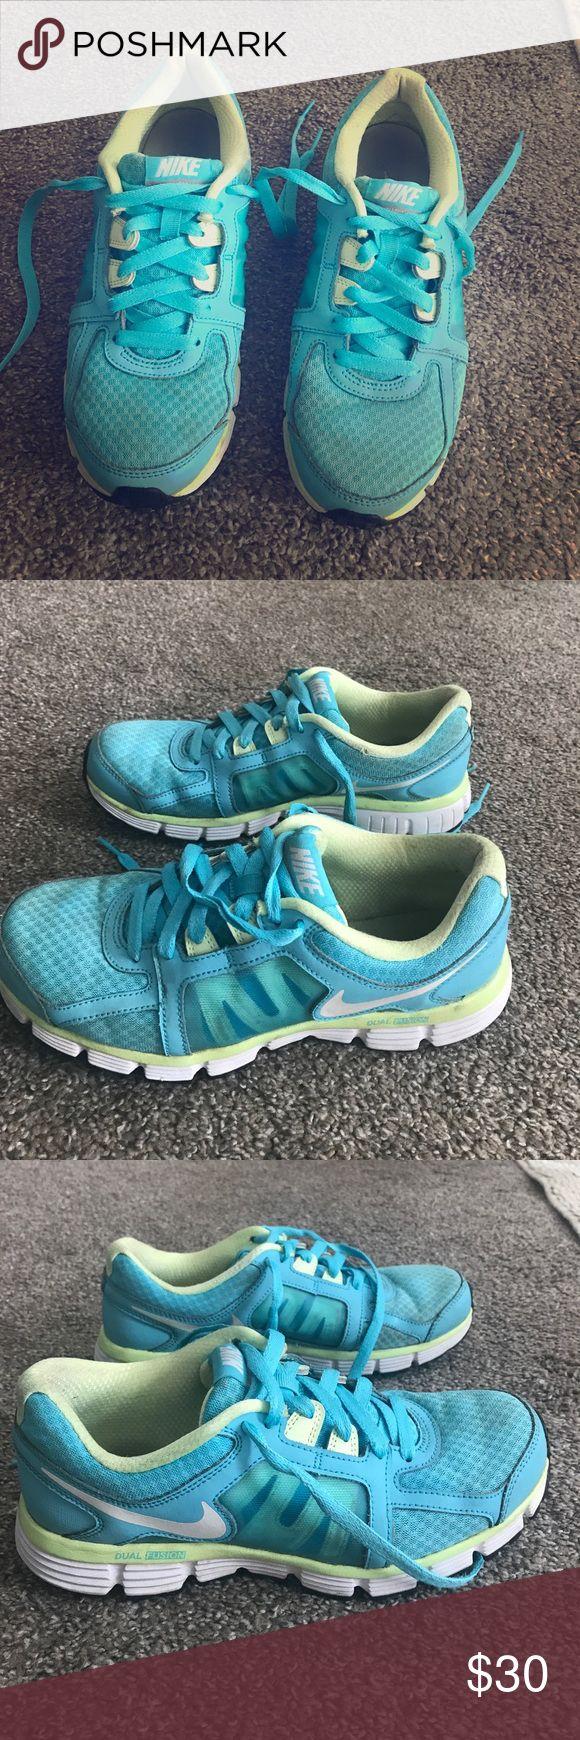 Nike Dual Fusion 8.5 tennis shoes Nike Dual Fusion size 8.5 tennis shoes Nike Shoes Athletic Shoes